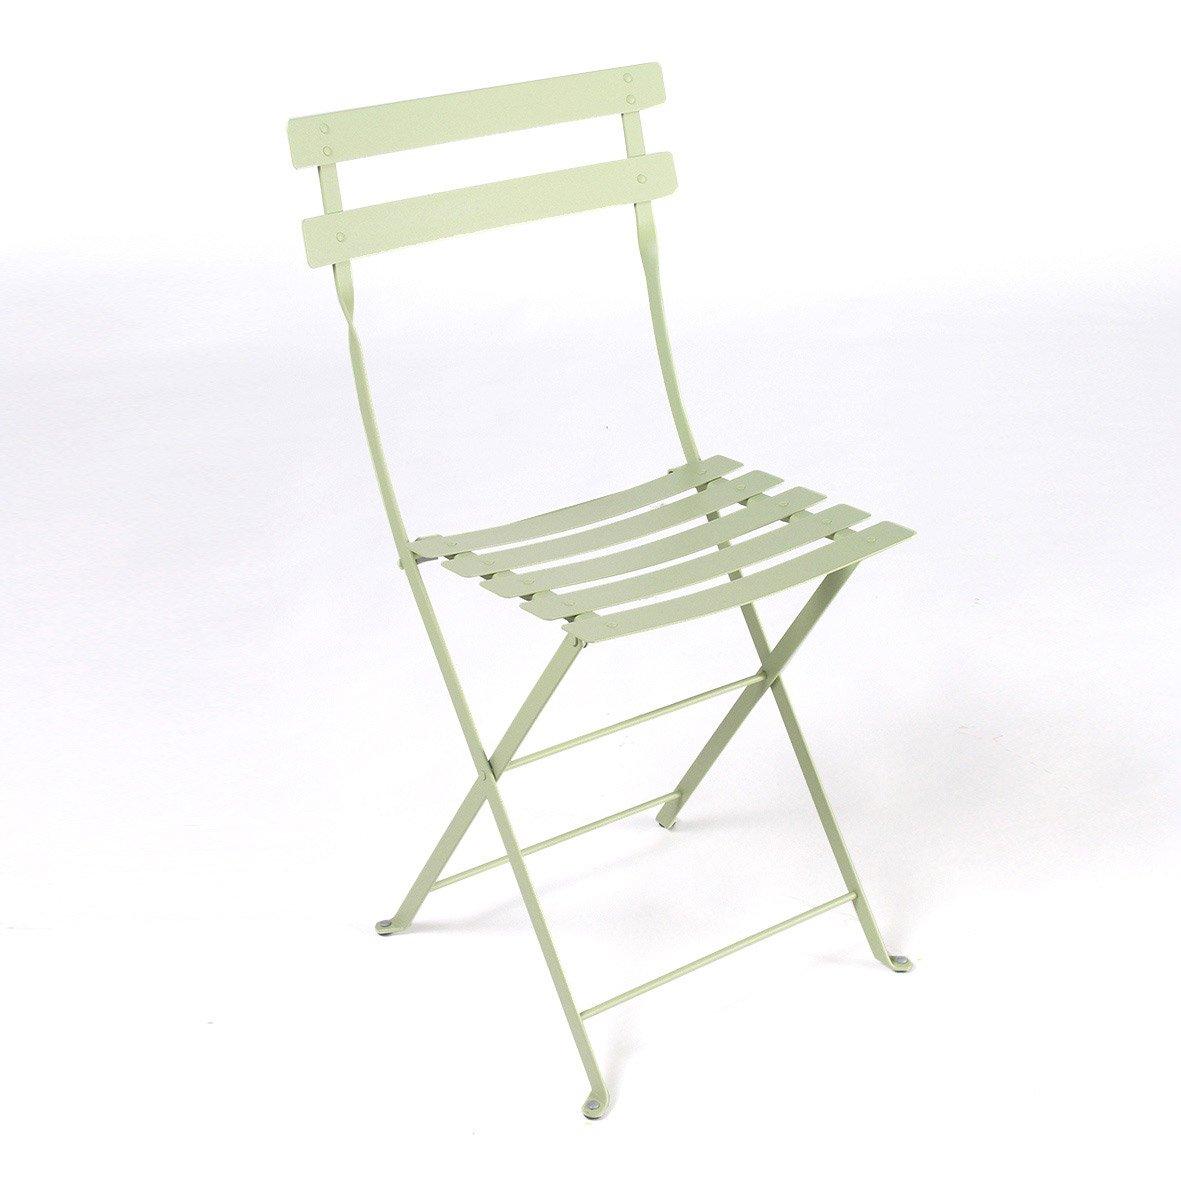 Chaise de jardin en acier Bistro tilleul | Leroy Merlin